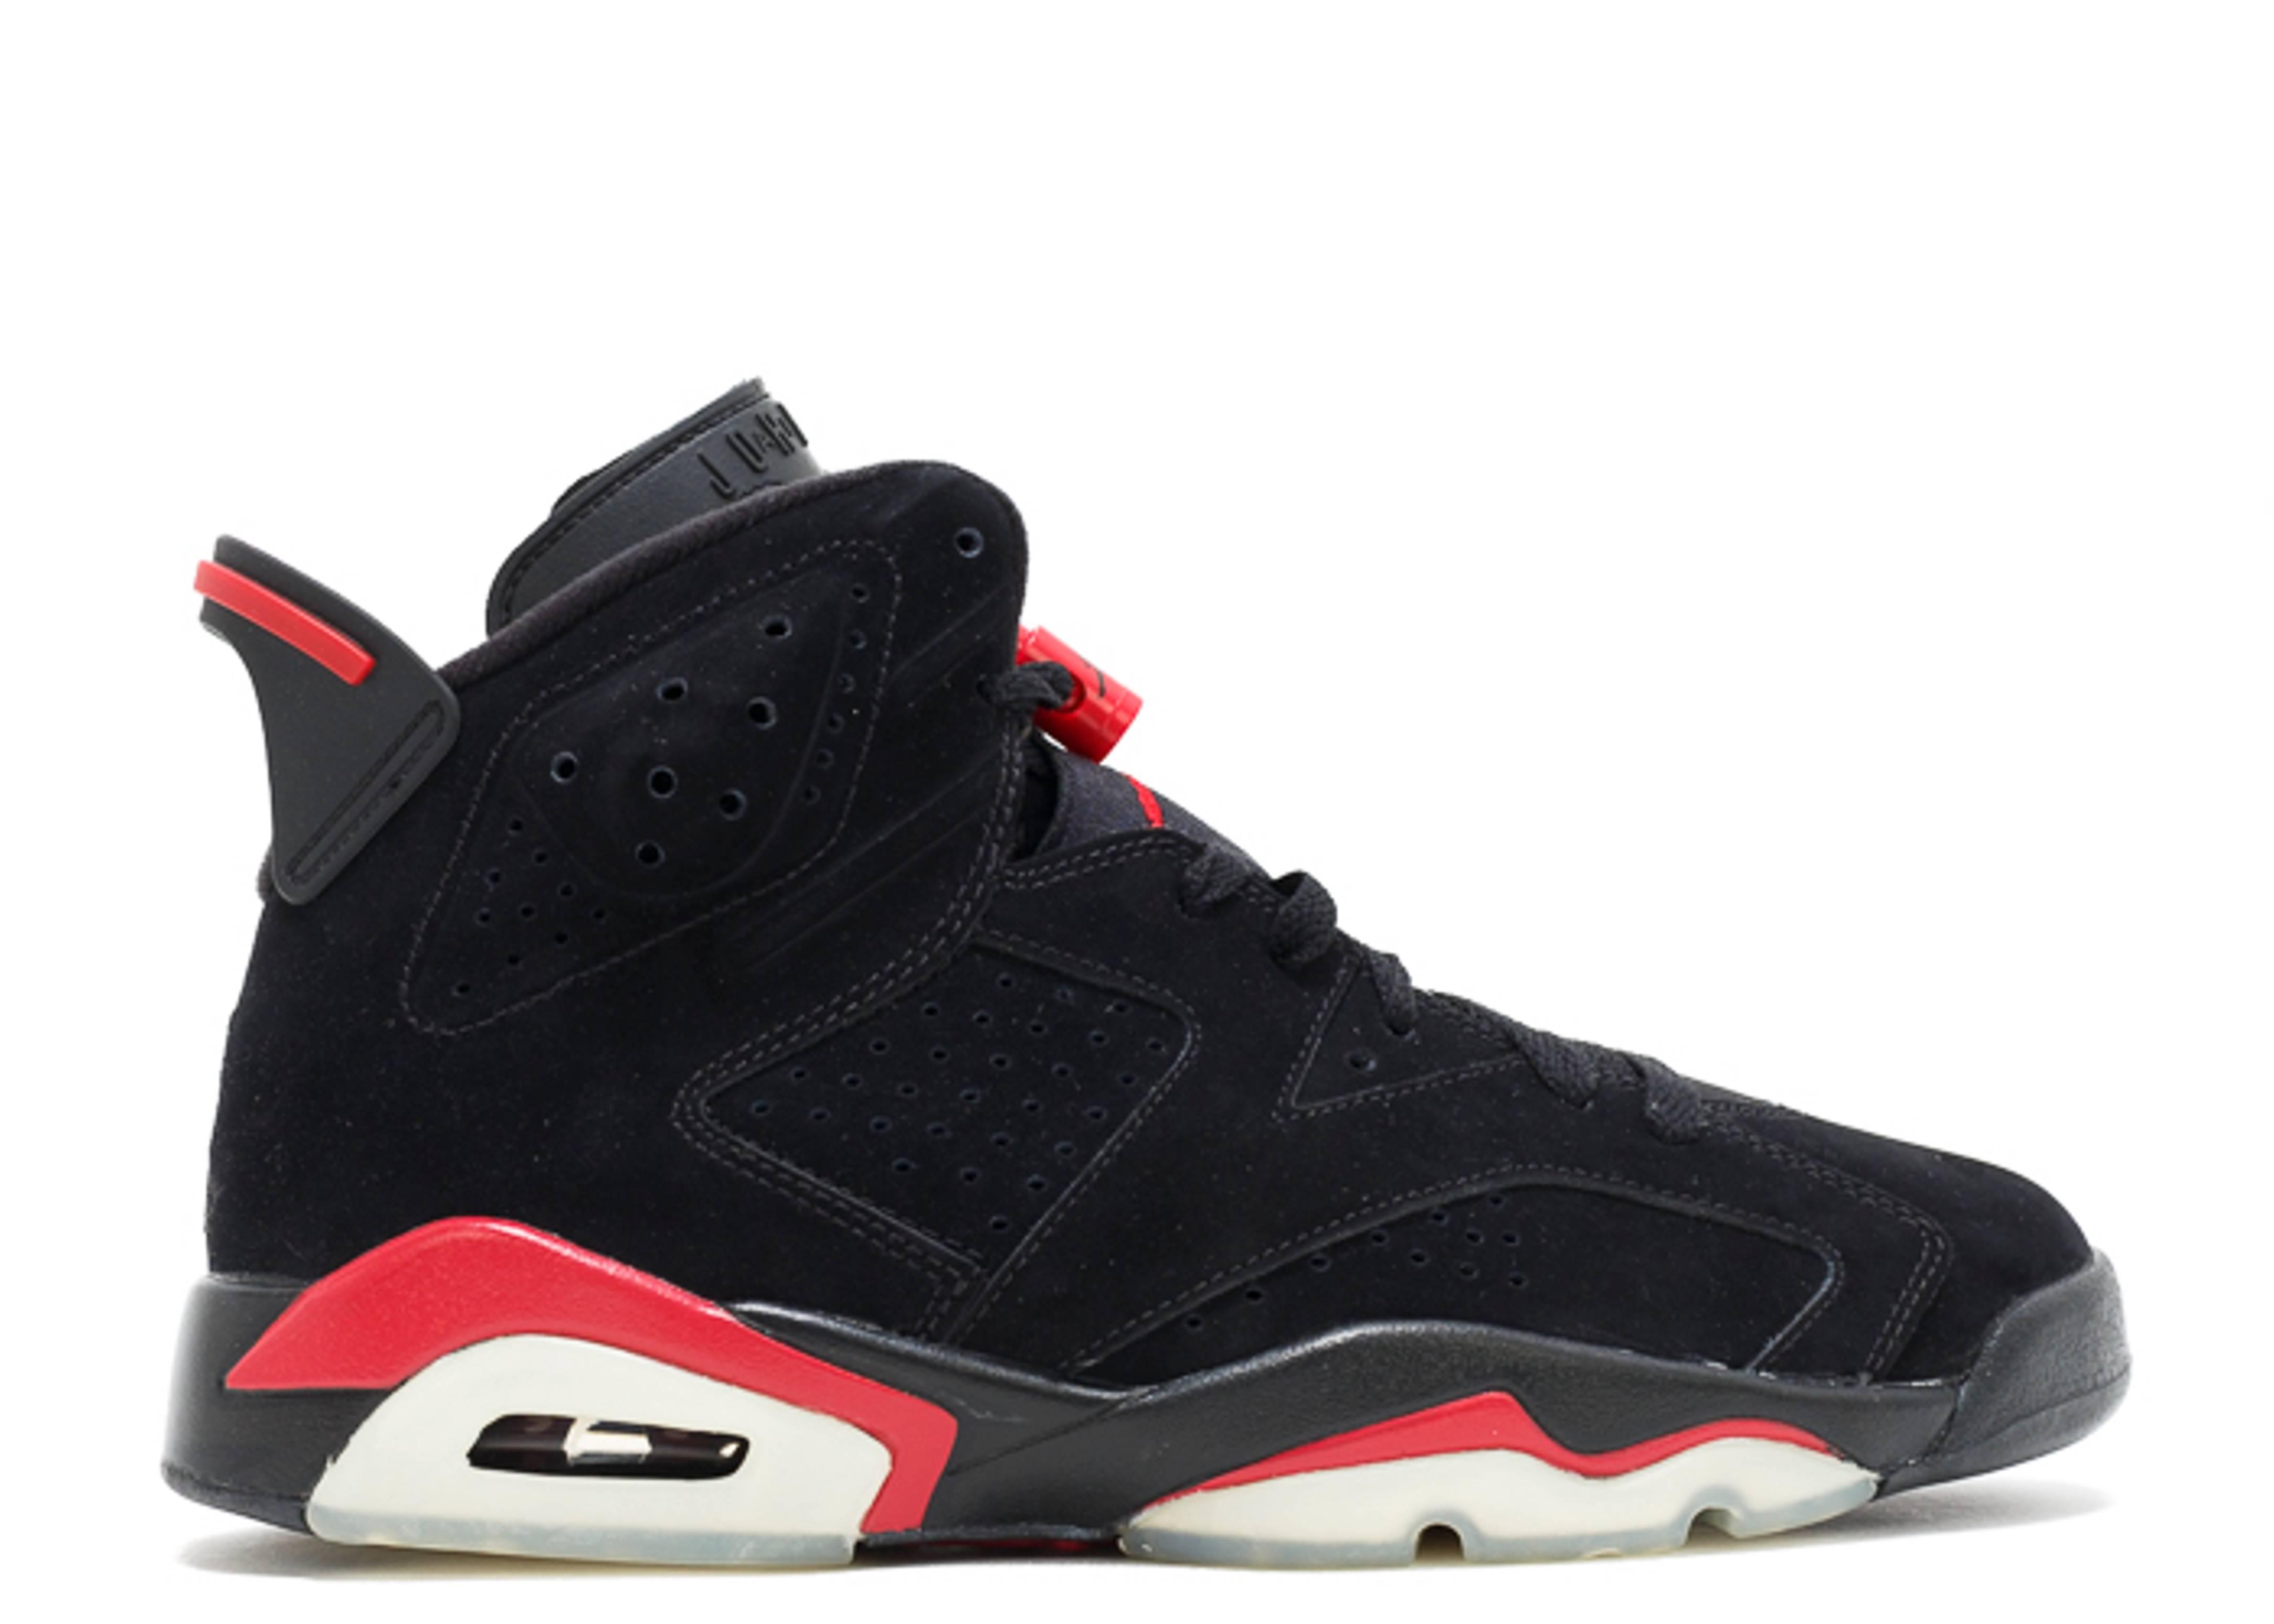 sale retailer c4828 c144e Air Jordan 6 Retro - Air Jordan - 384664 061 - black varsity red   Flight  Club